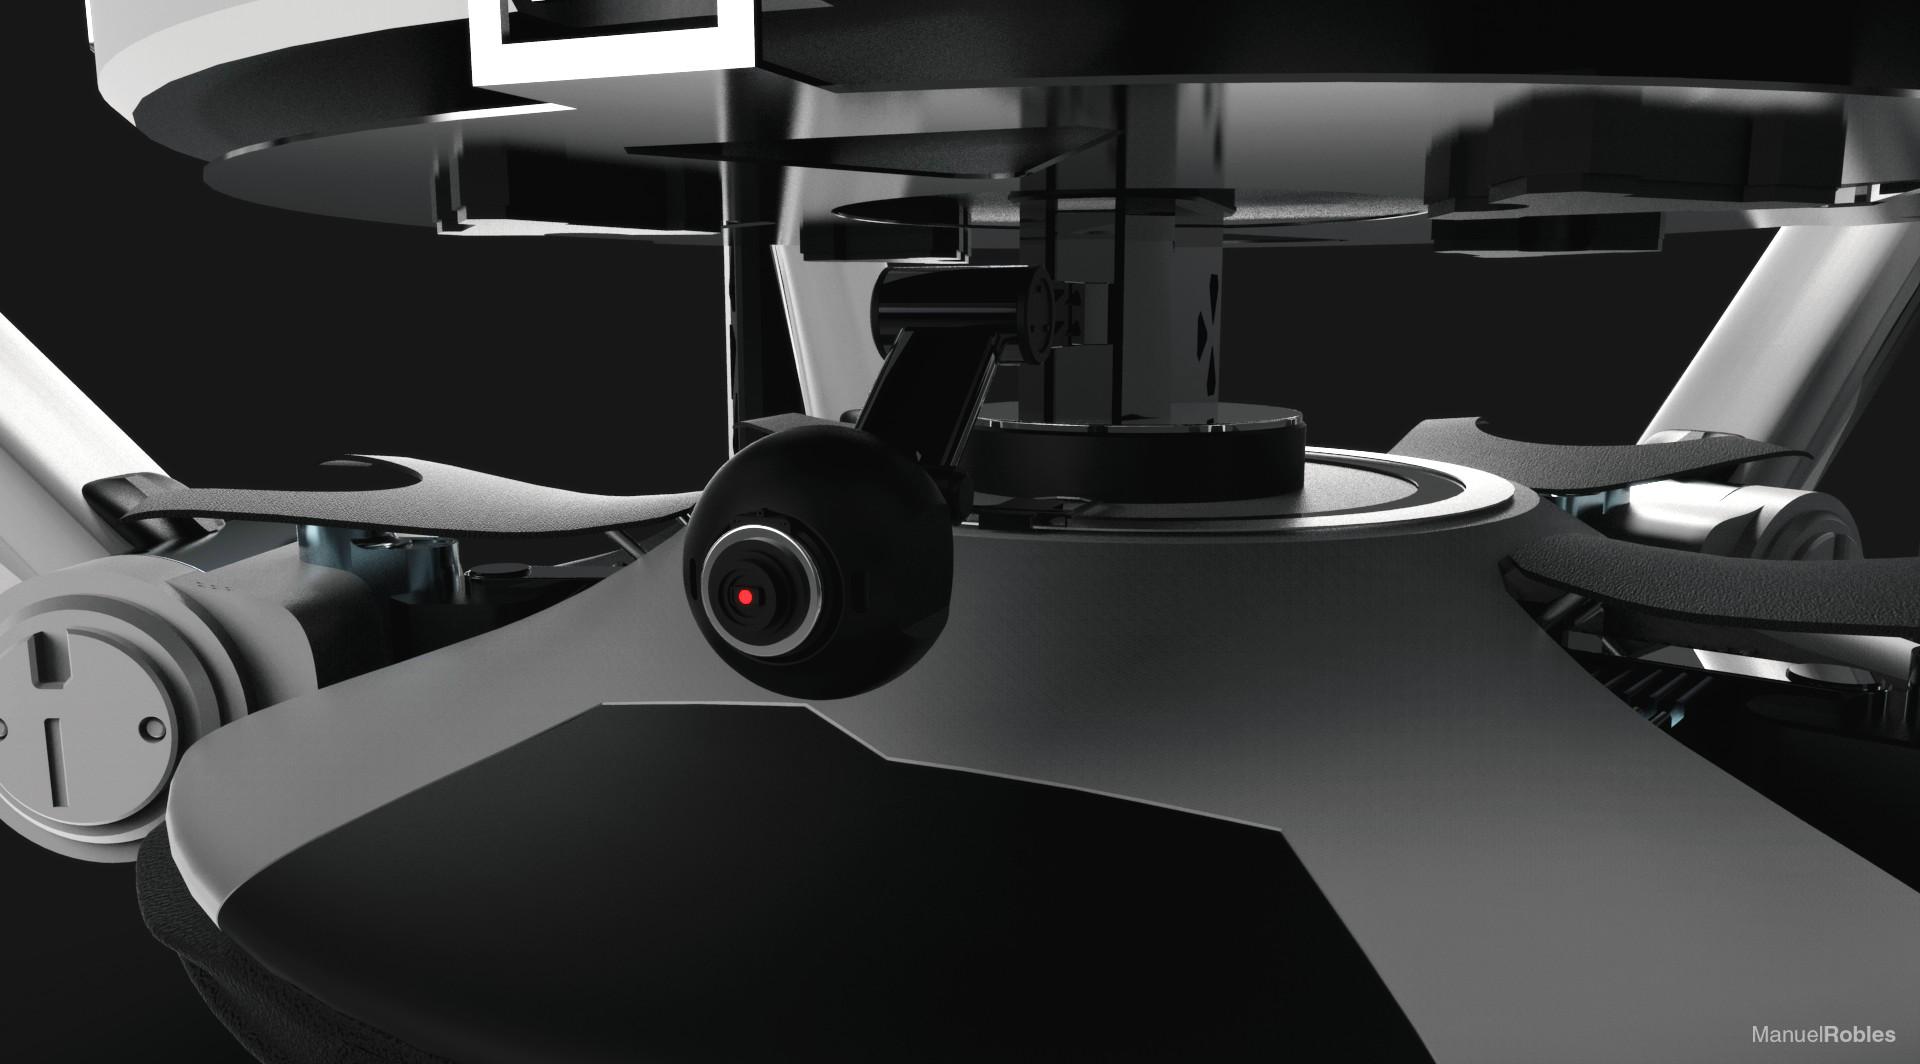 Manuel robles spider robotdron 02 viewset 25